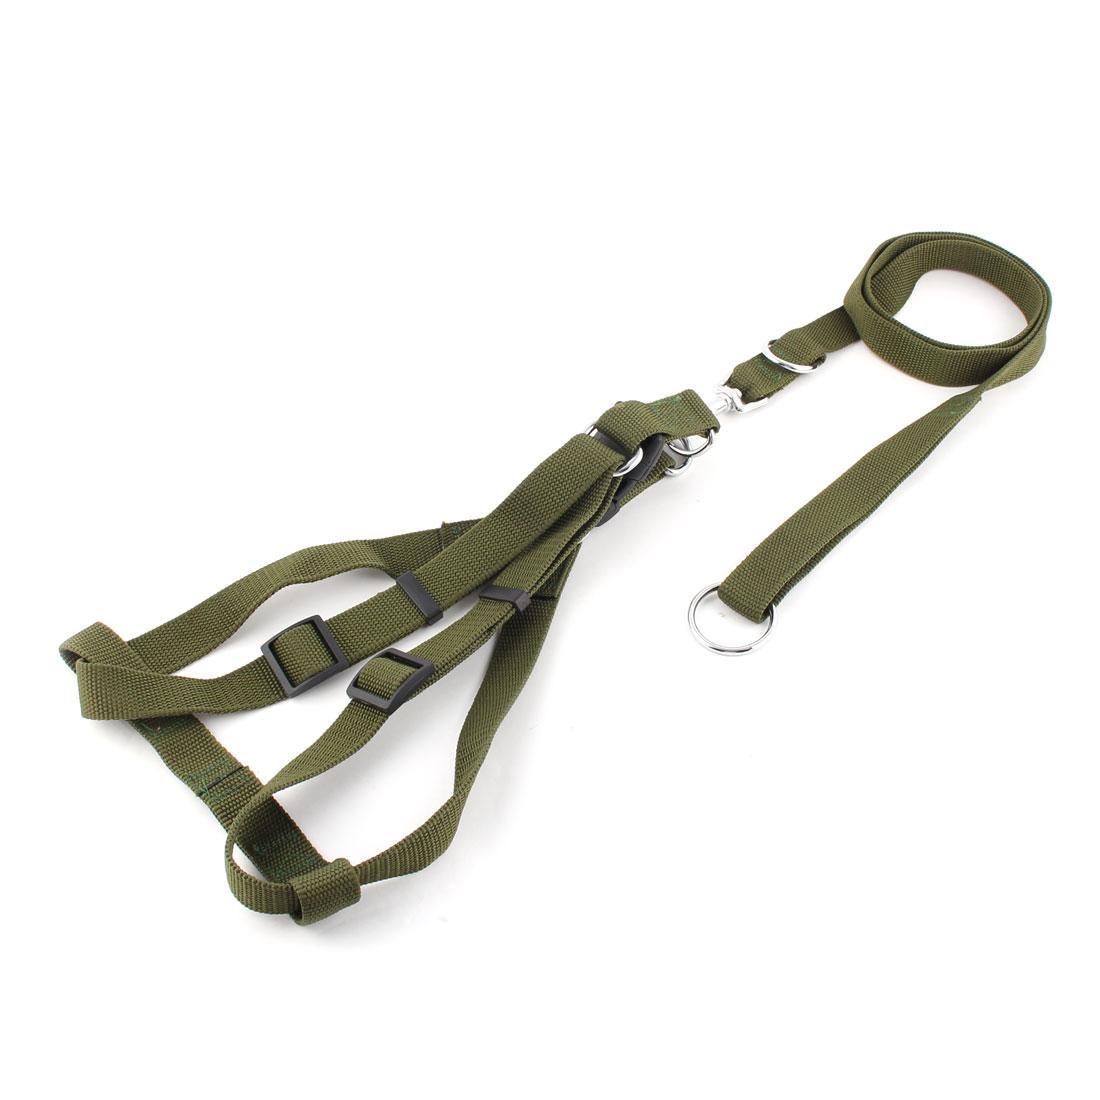 Pet Dog Doggie Nylon Rope Lead Adjustable Harness Leash Neck Collar Army Green